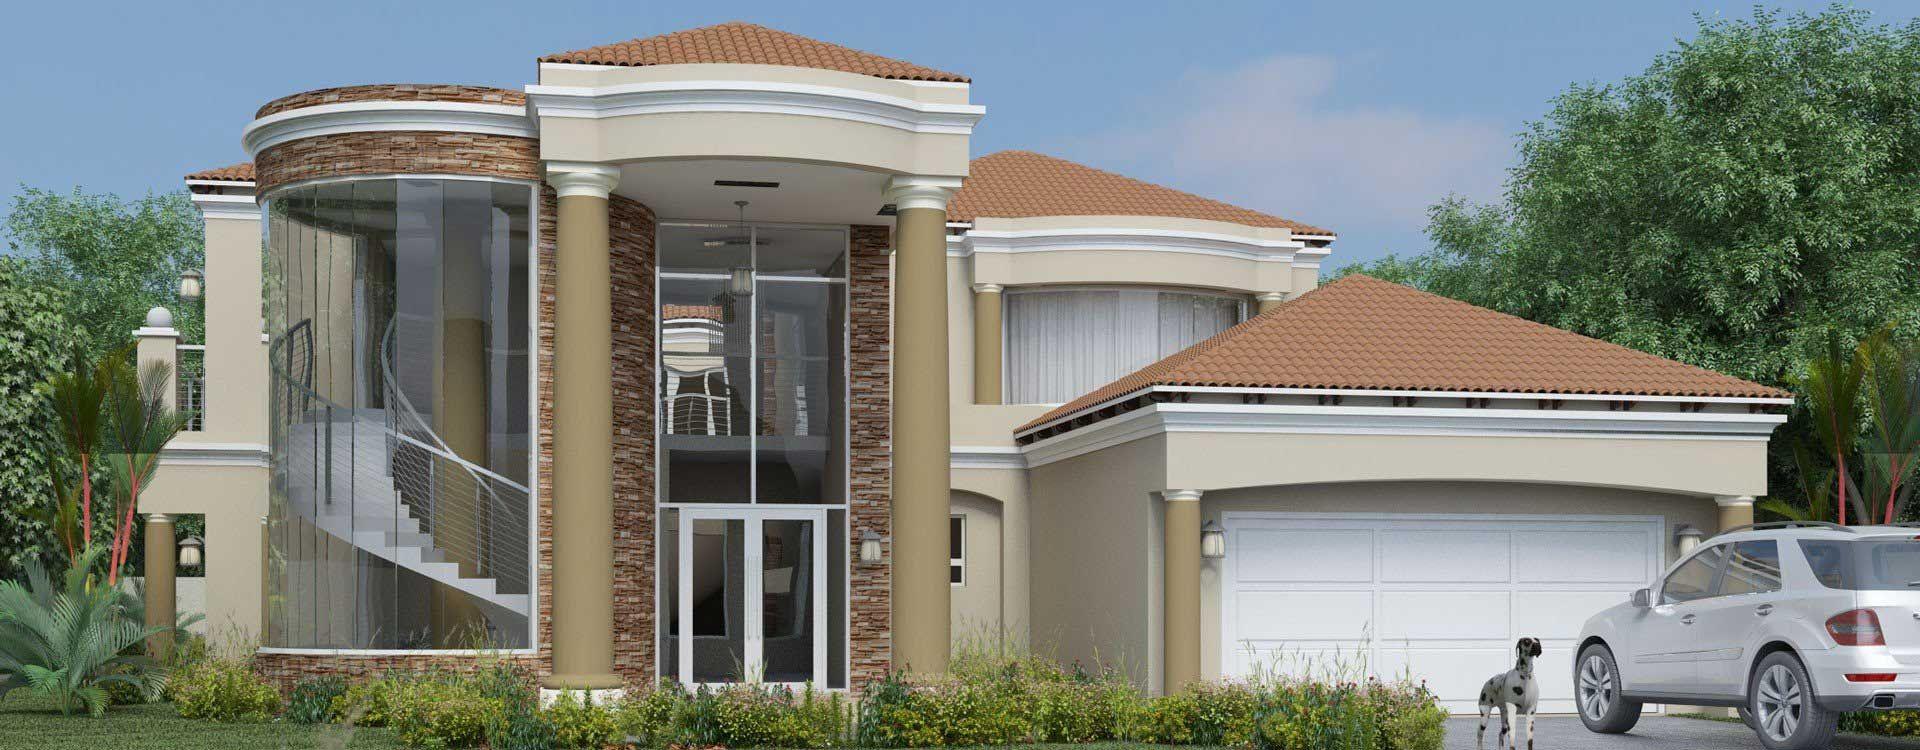 best designed house plans - Best House Plans